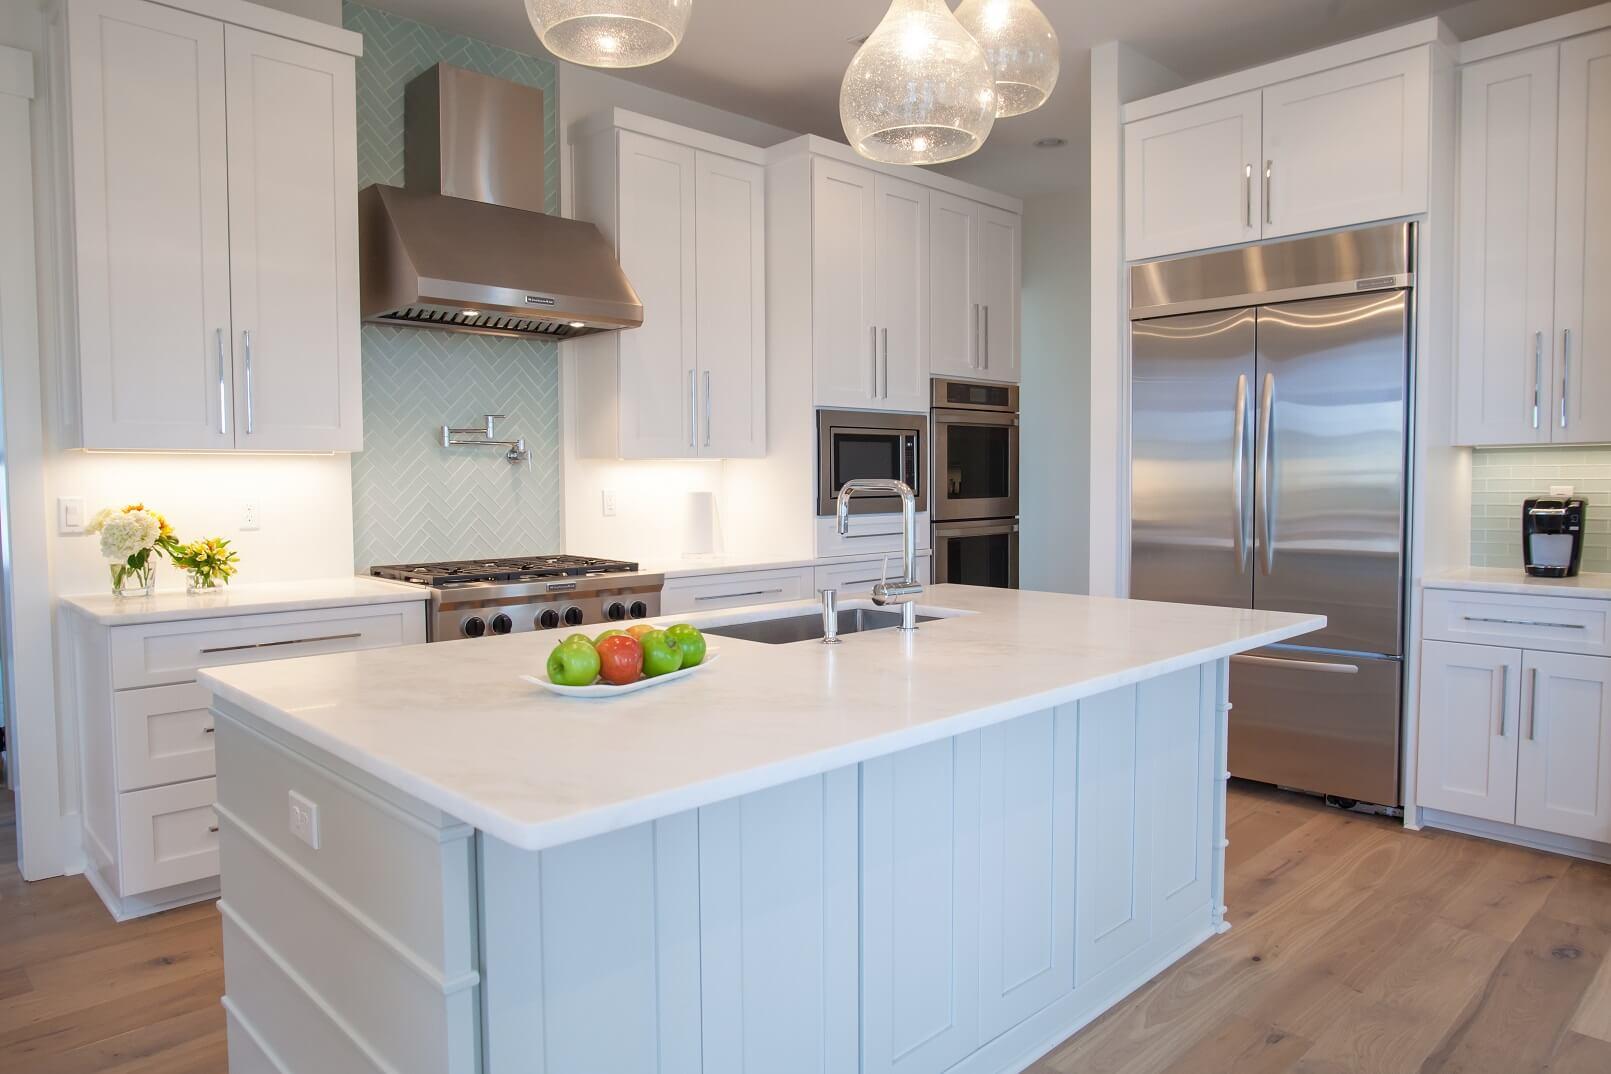 Rhino White Honed Superior Granite Natural Stone Quartz Supplier Fabrication Installation In Pensacola Pace Fl